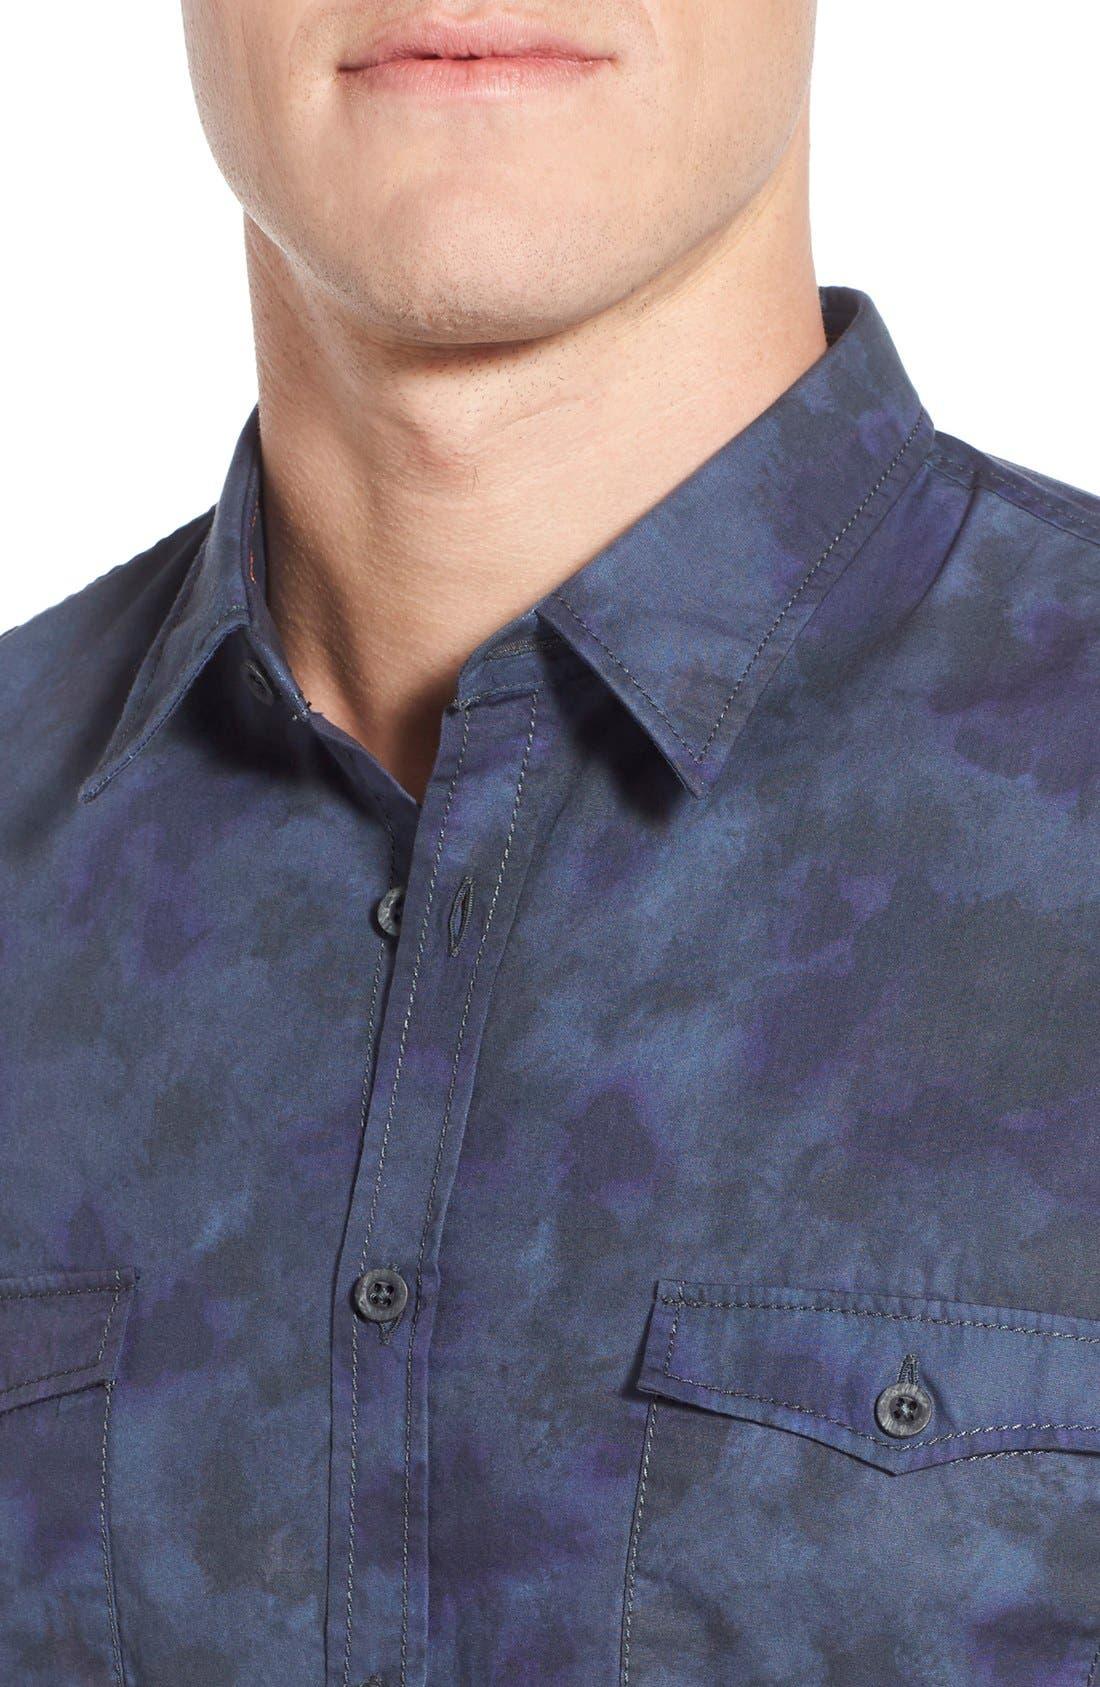 Edoslime Extra Trim Fit Print Woven Shirt,                             Alternate thumbnail 4, color,                             Dark Blue